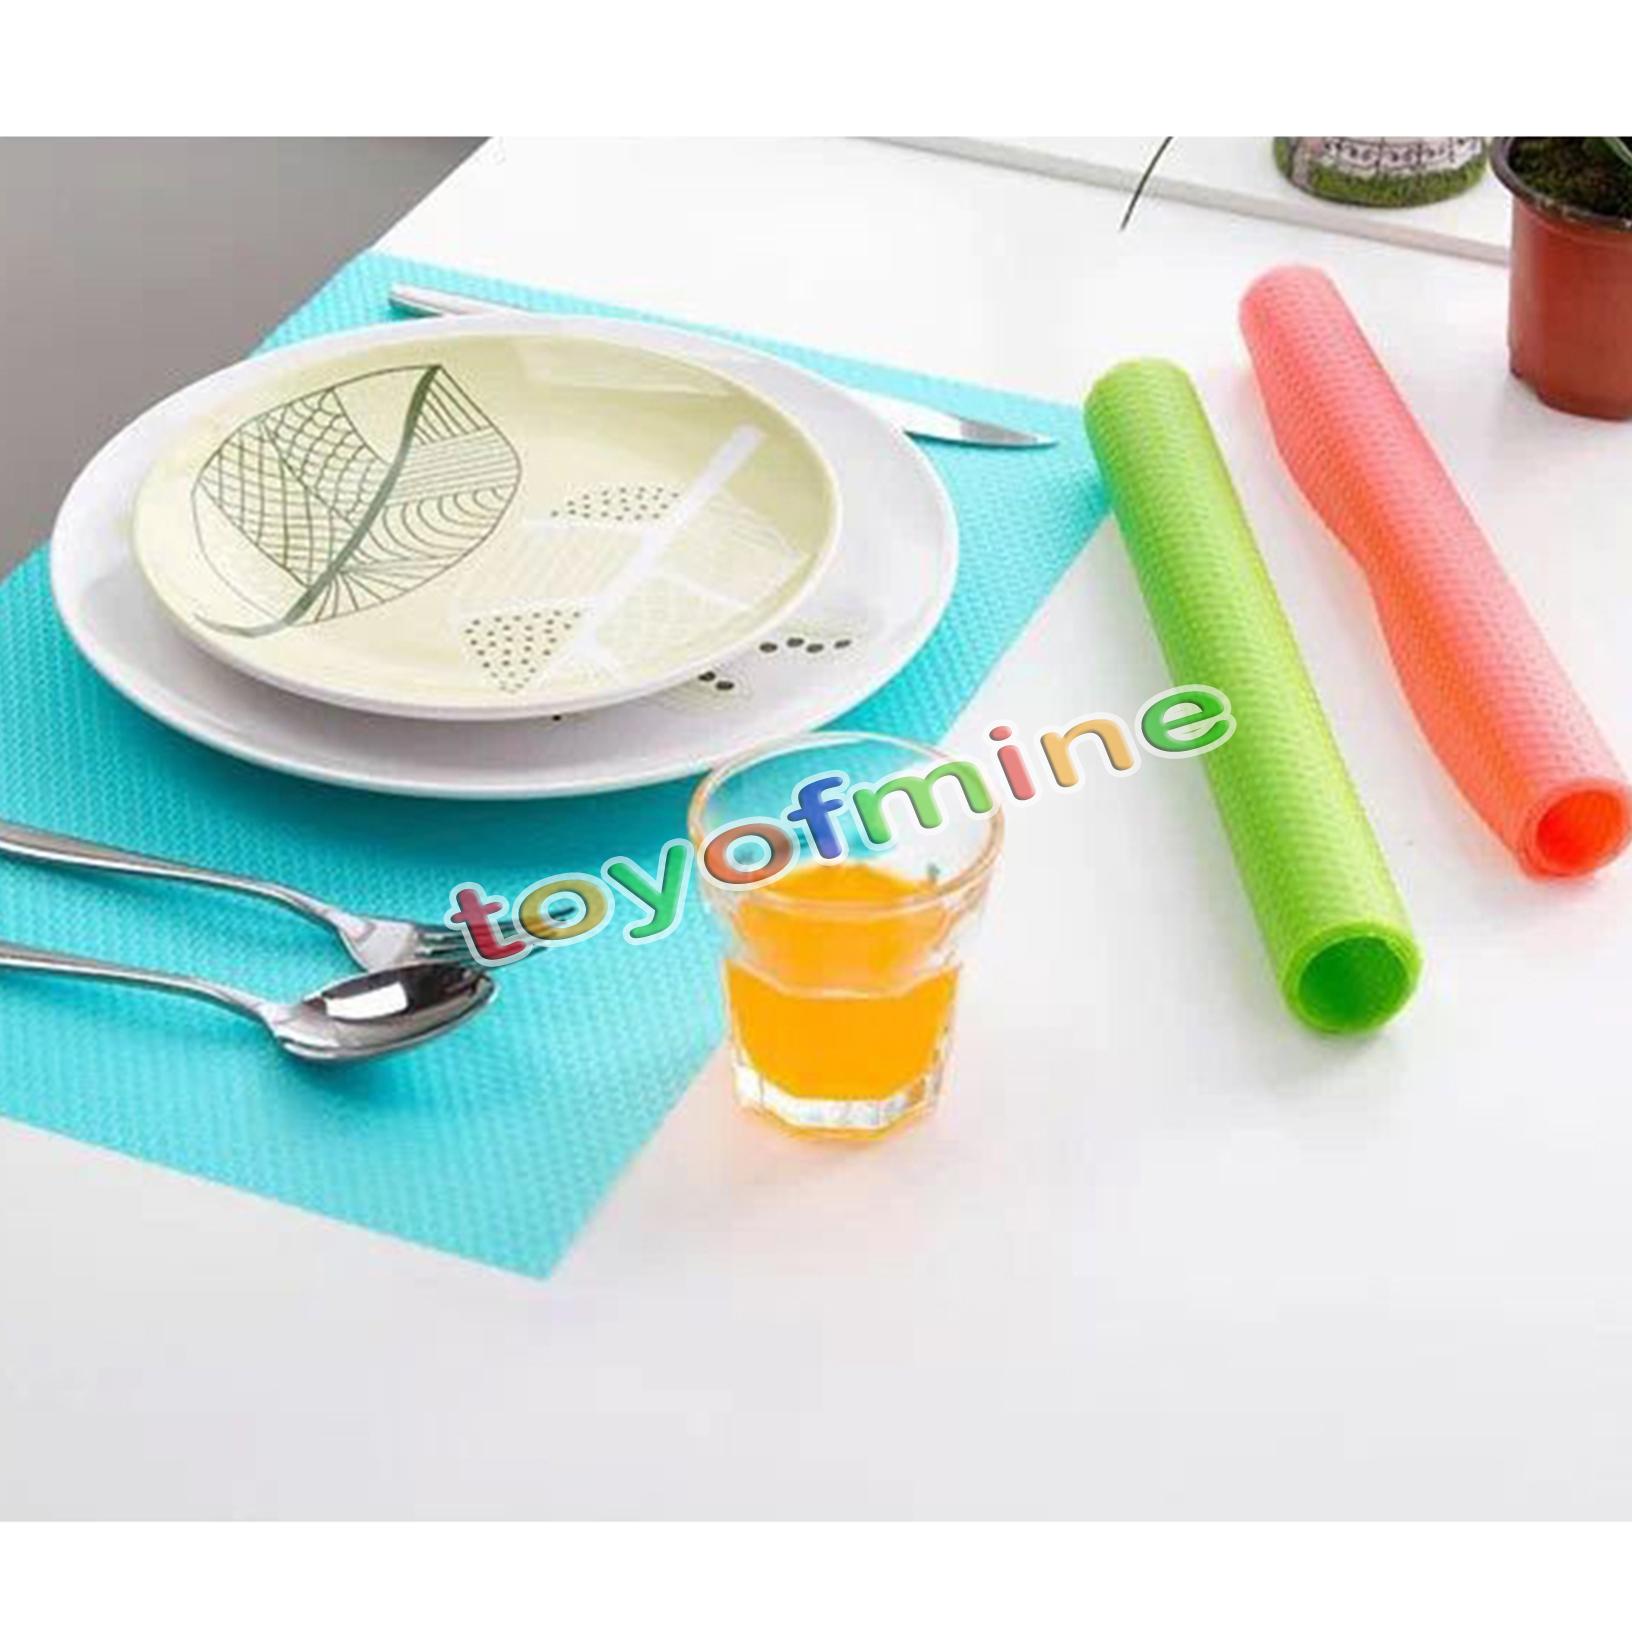 4 x kühlschrank antifouling pad wasserdichte matten  ~ Kühlschrank Nass